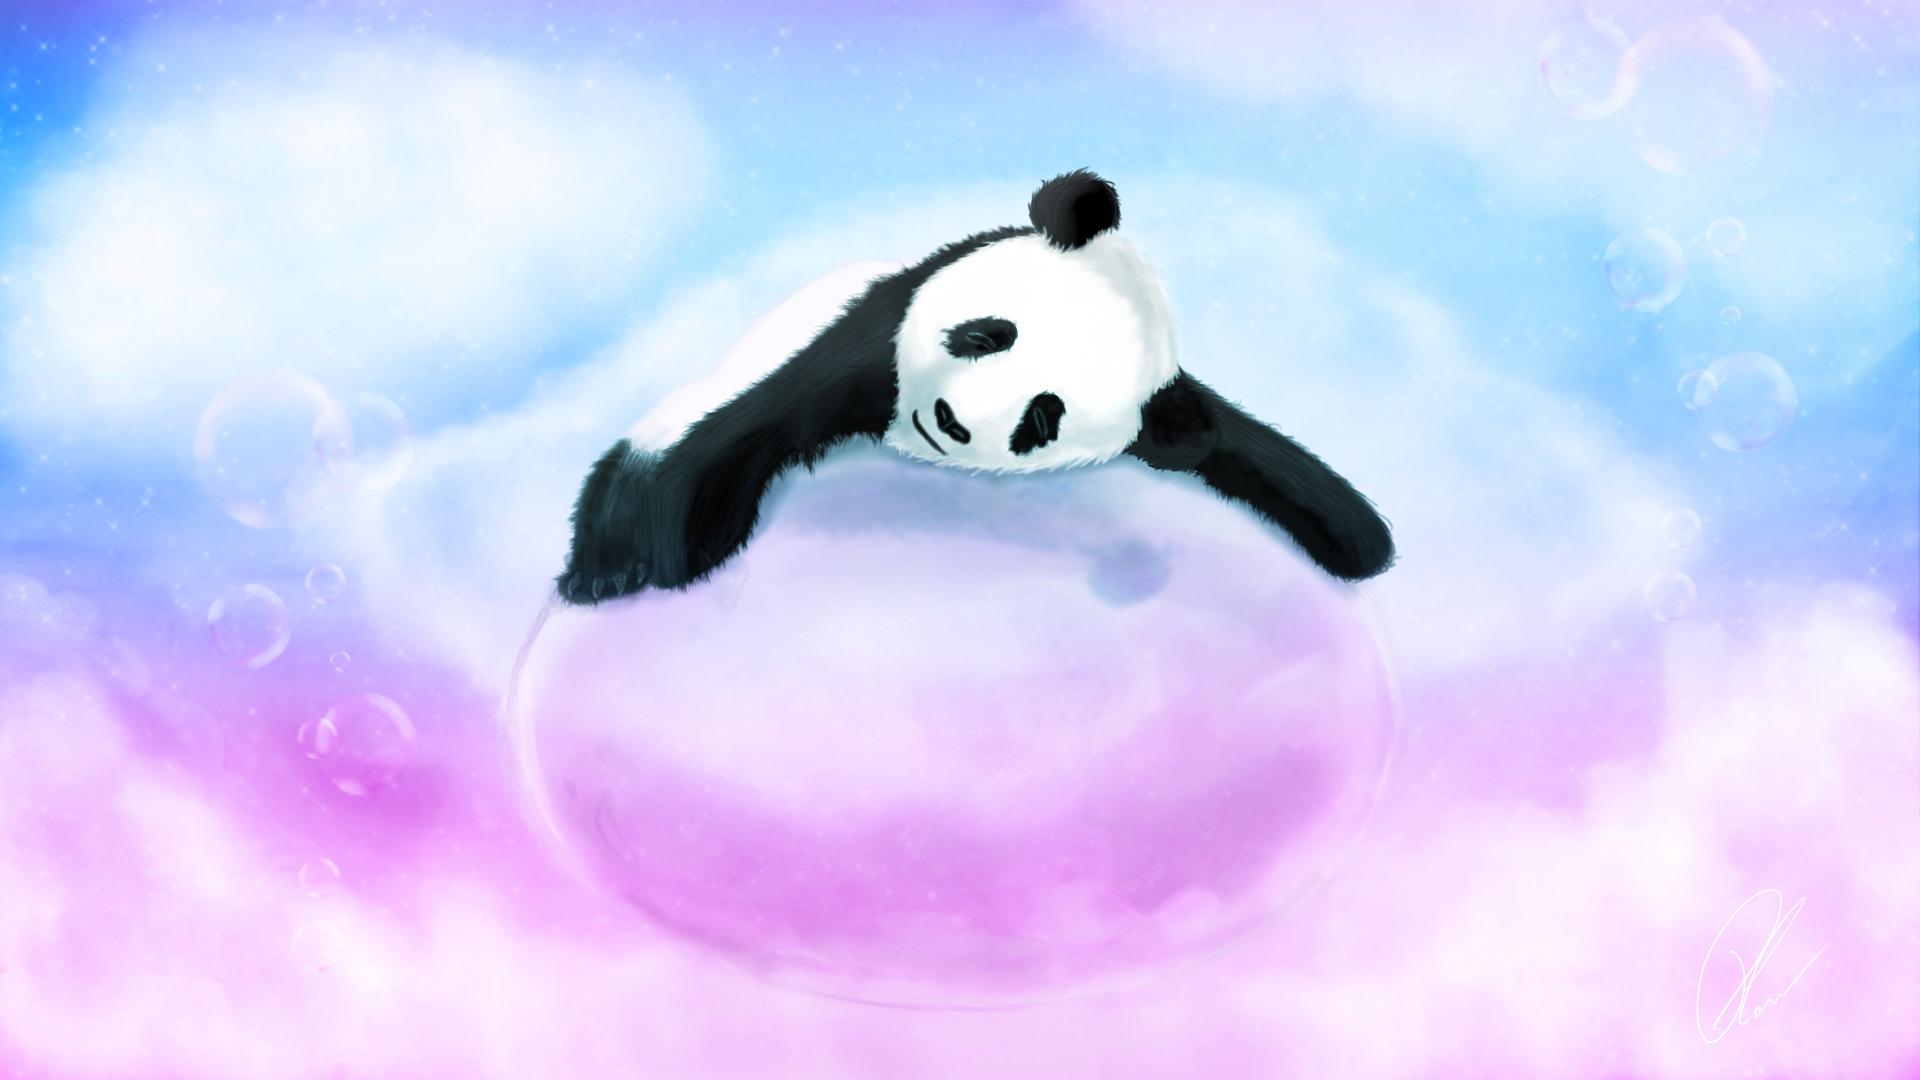 Panda bear bubble lying bubbles pink blue sleeping wallpapers 1920x1080